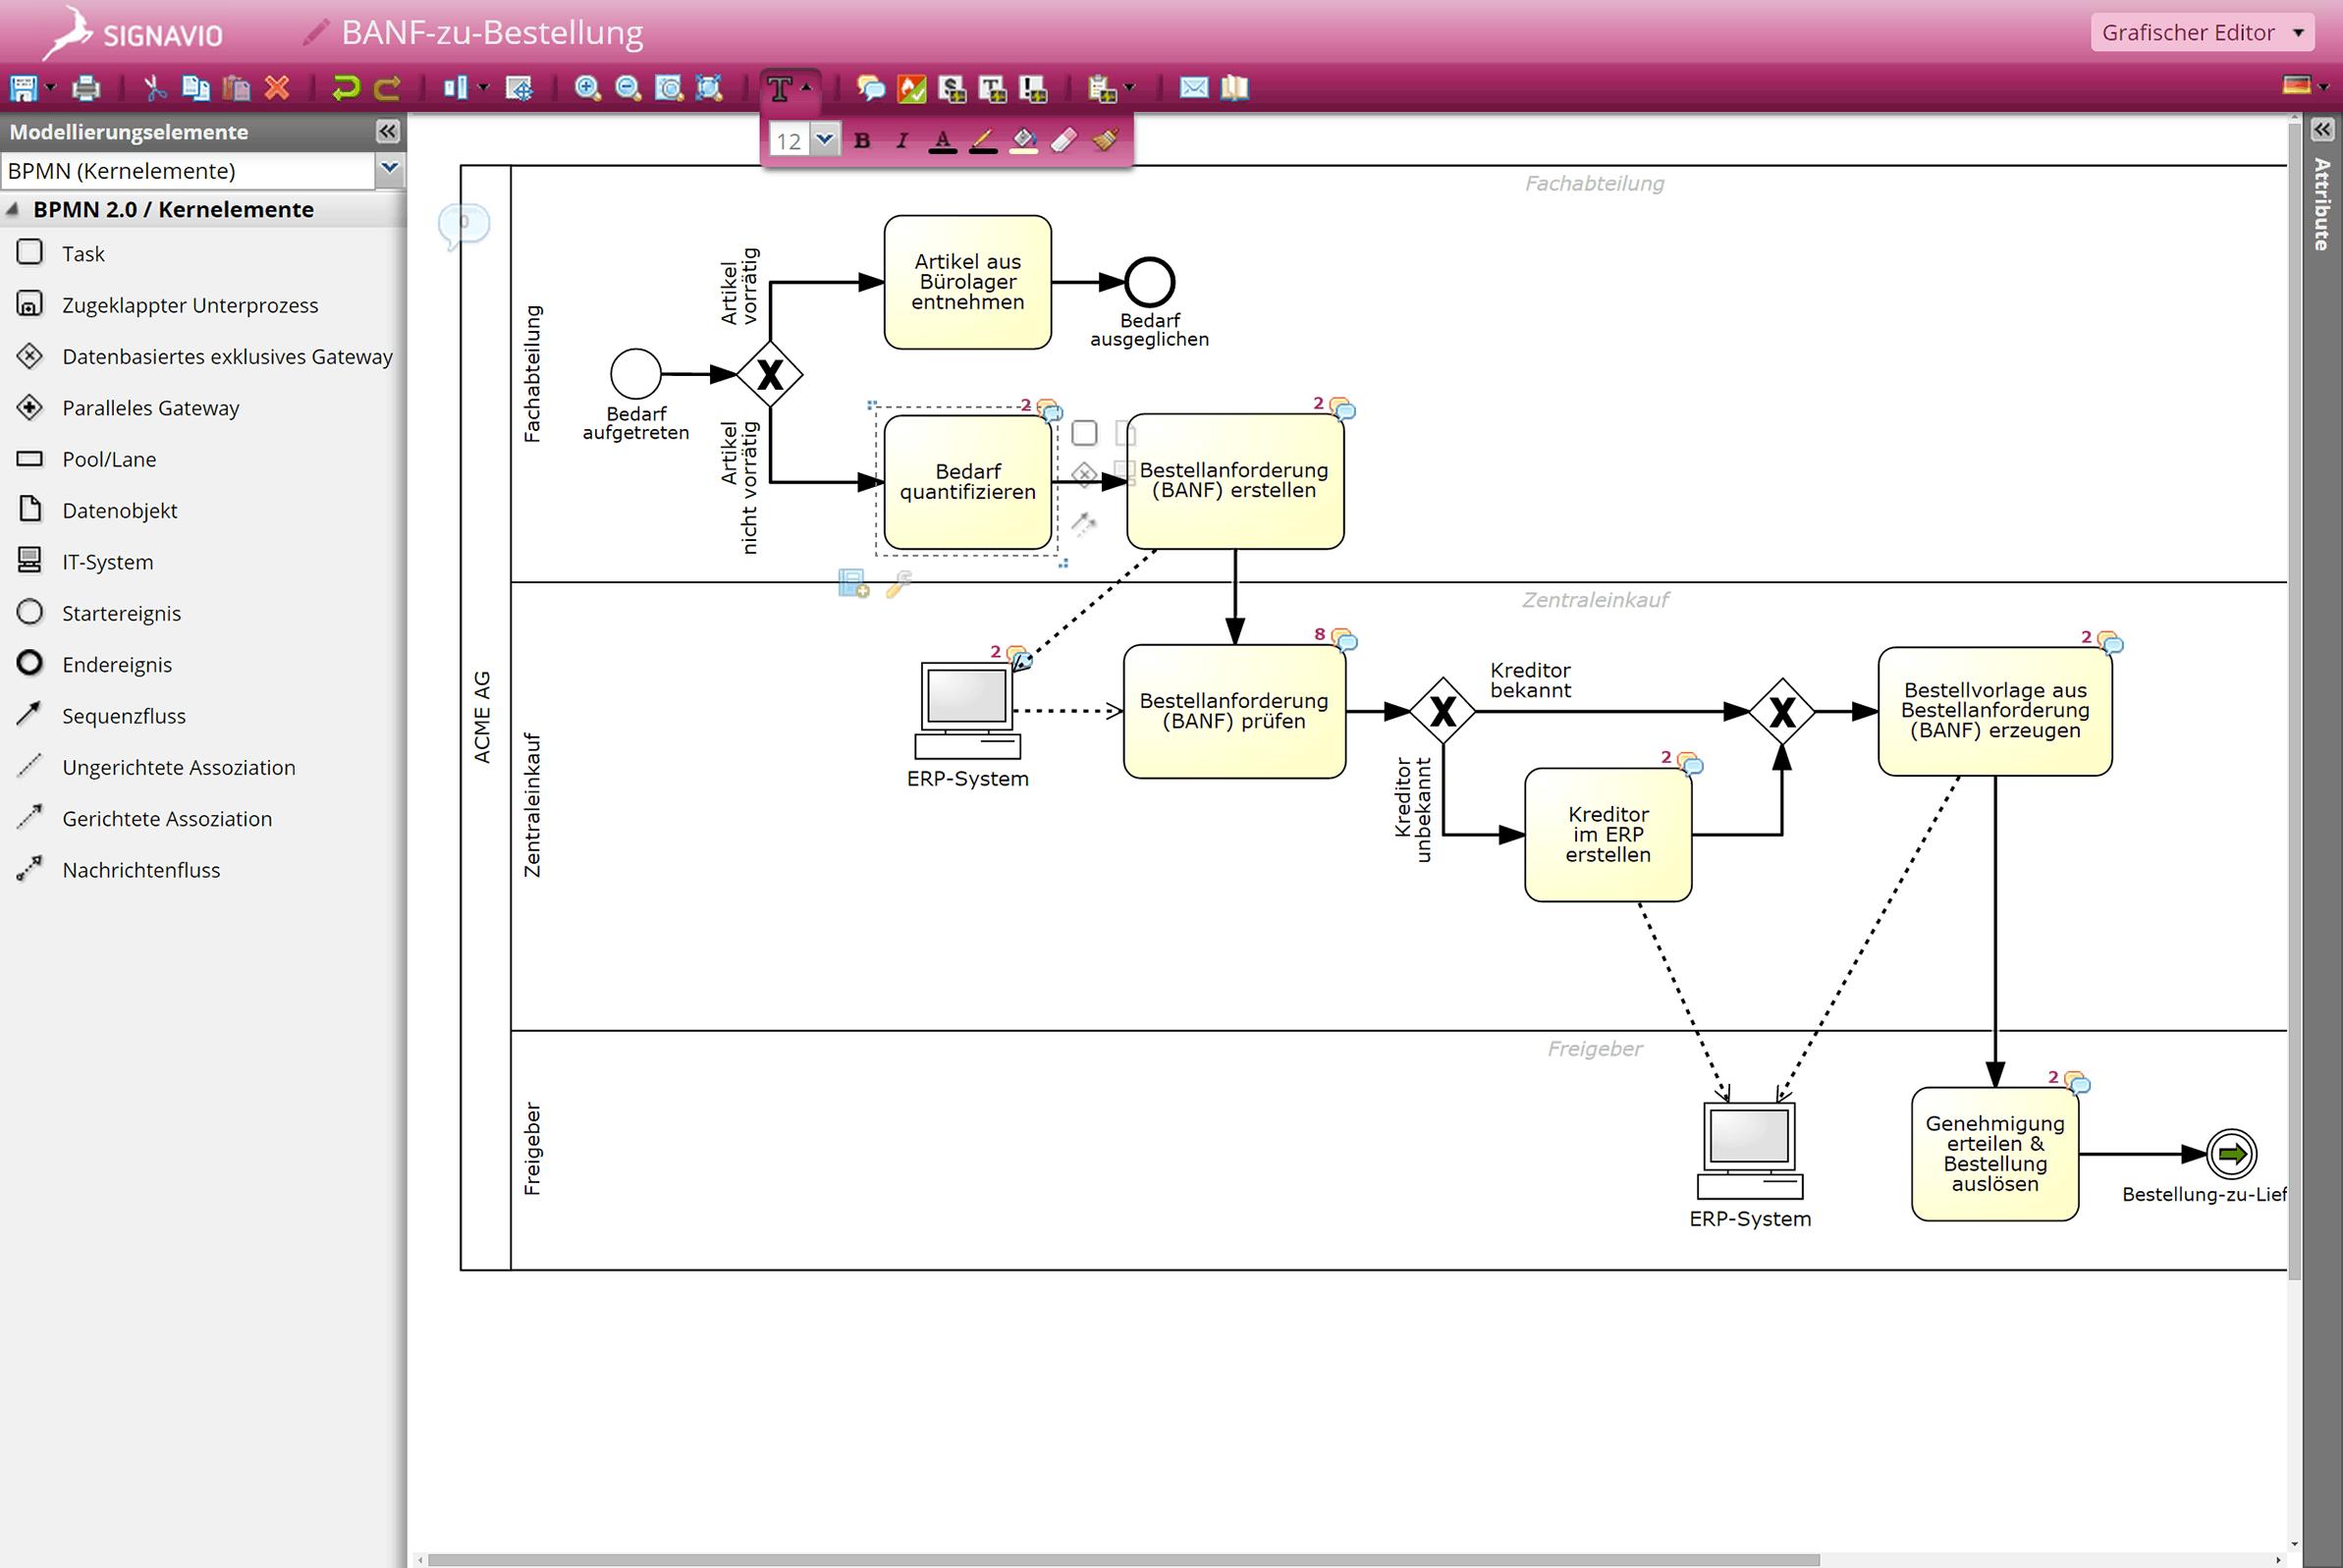 BPMN 2.0 Diagramm im Signavio Process Editor